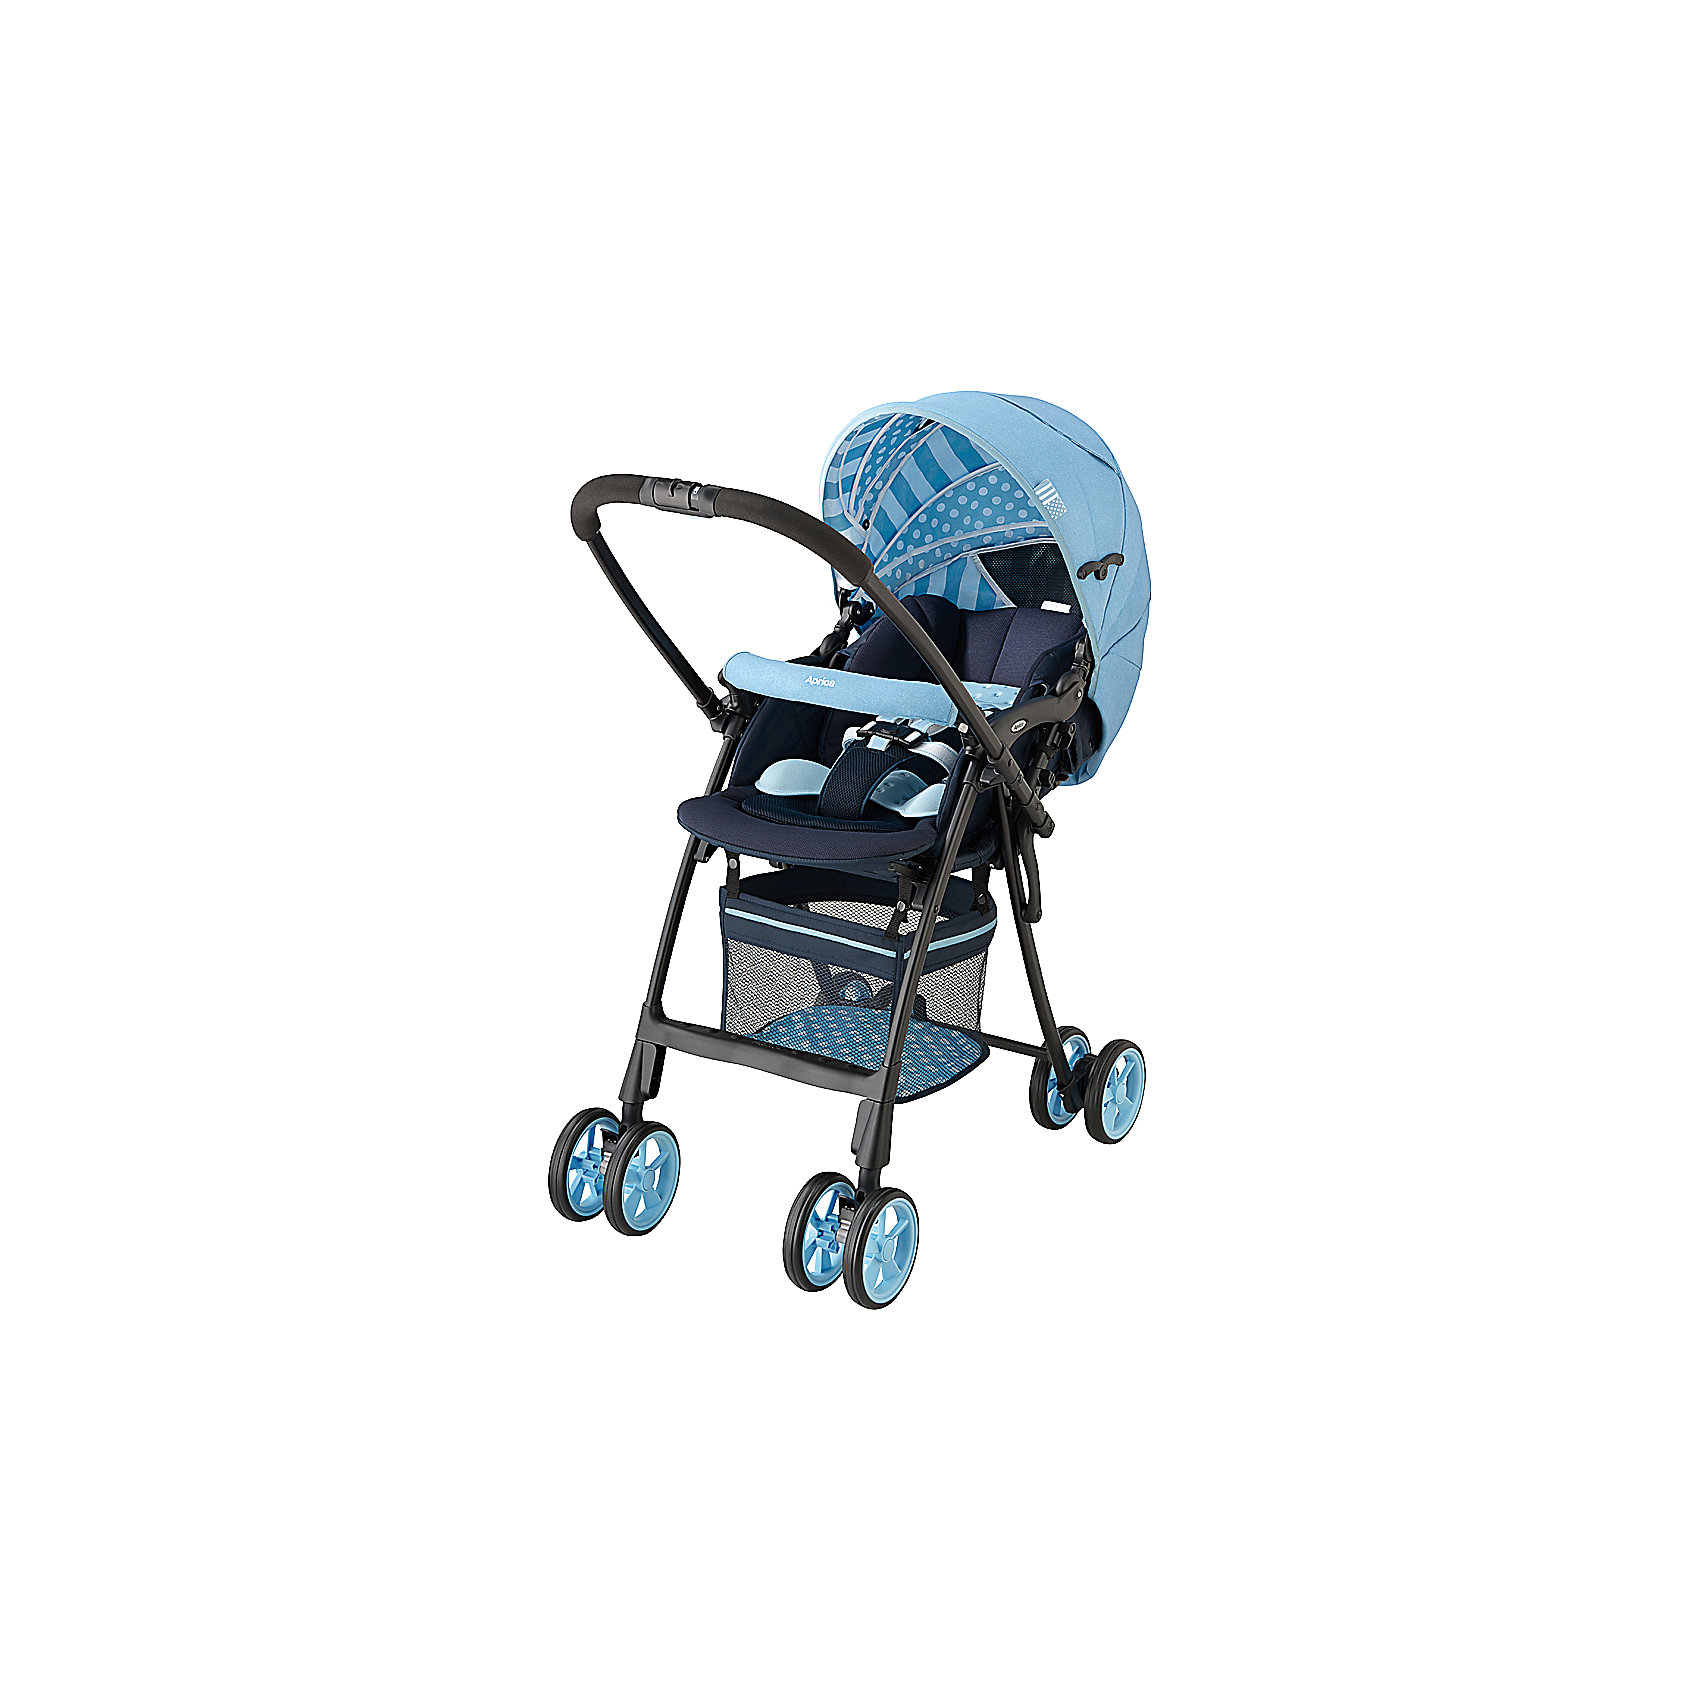 Прогулочная коляска FlyLe dungaree blue, Aprica, голубой